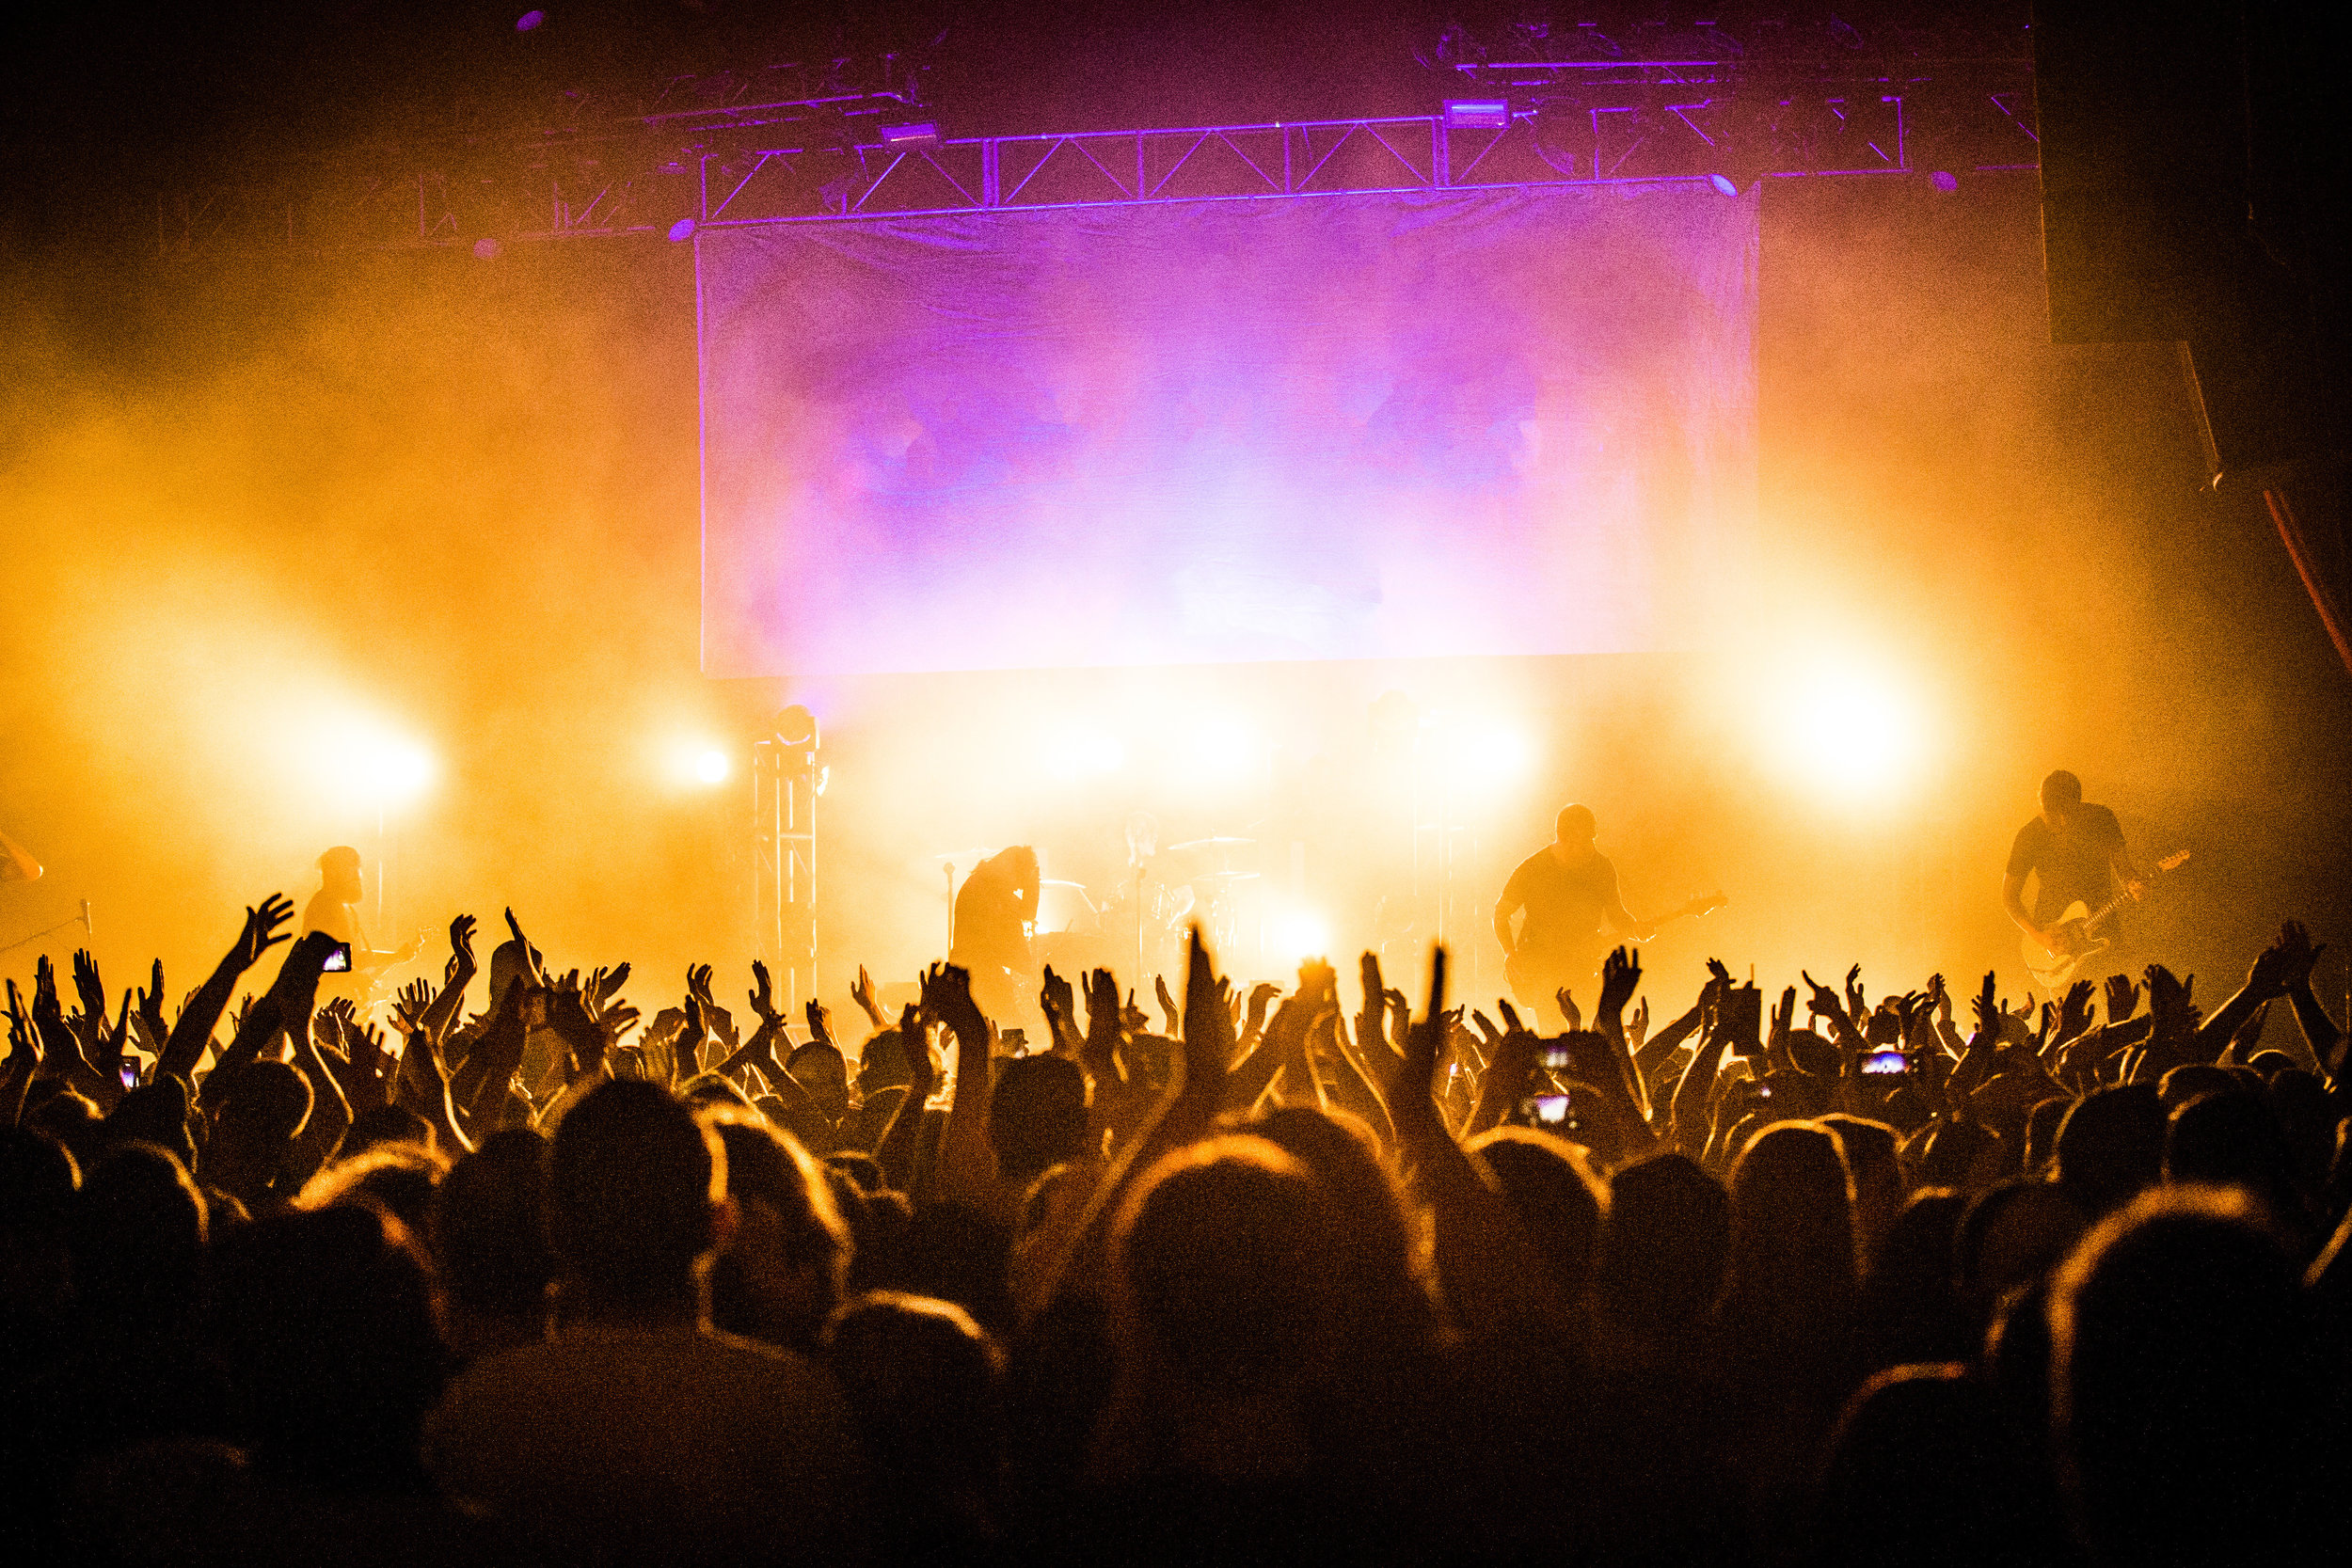 Sound Works Concert Production - Let us handle your next concert experience